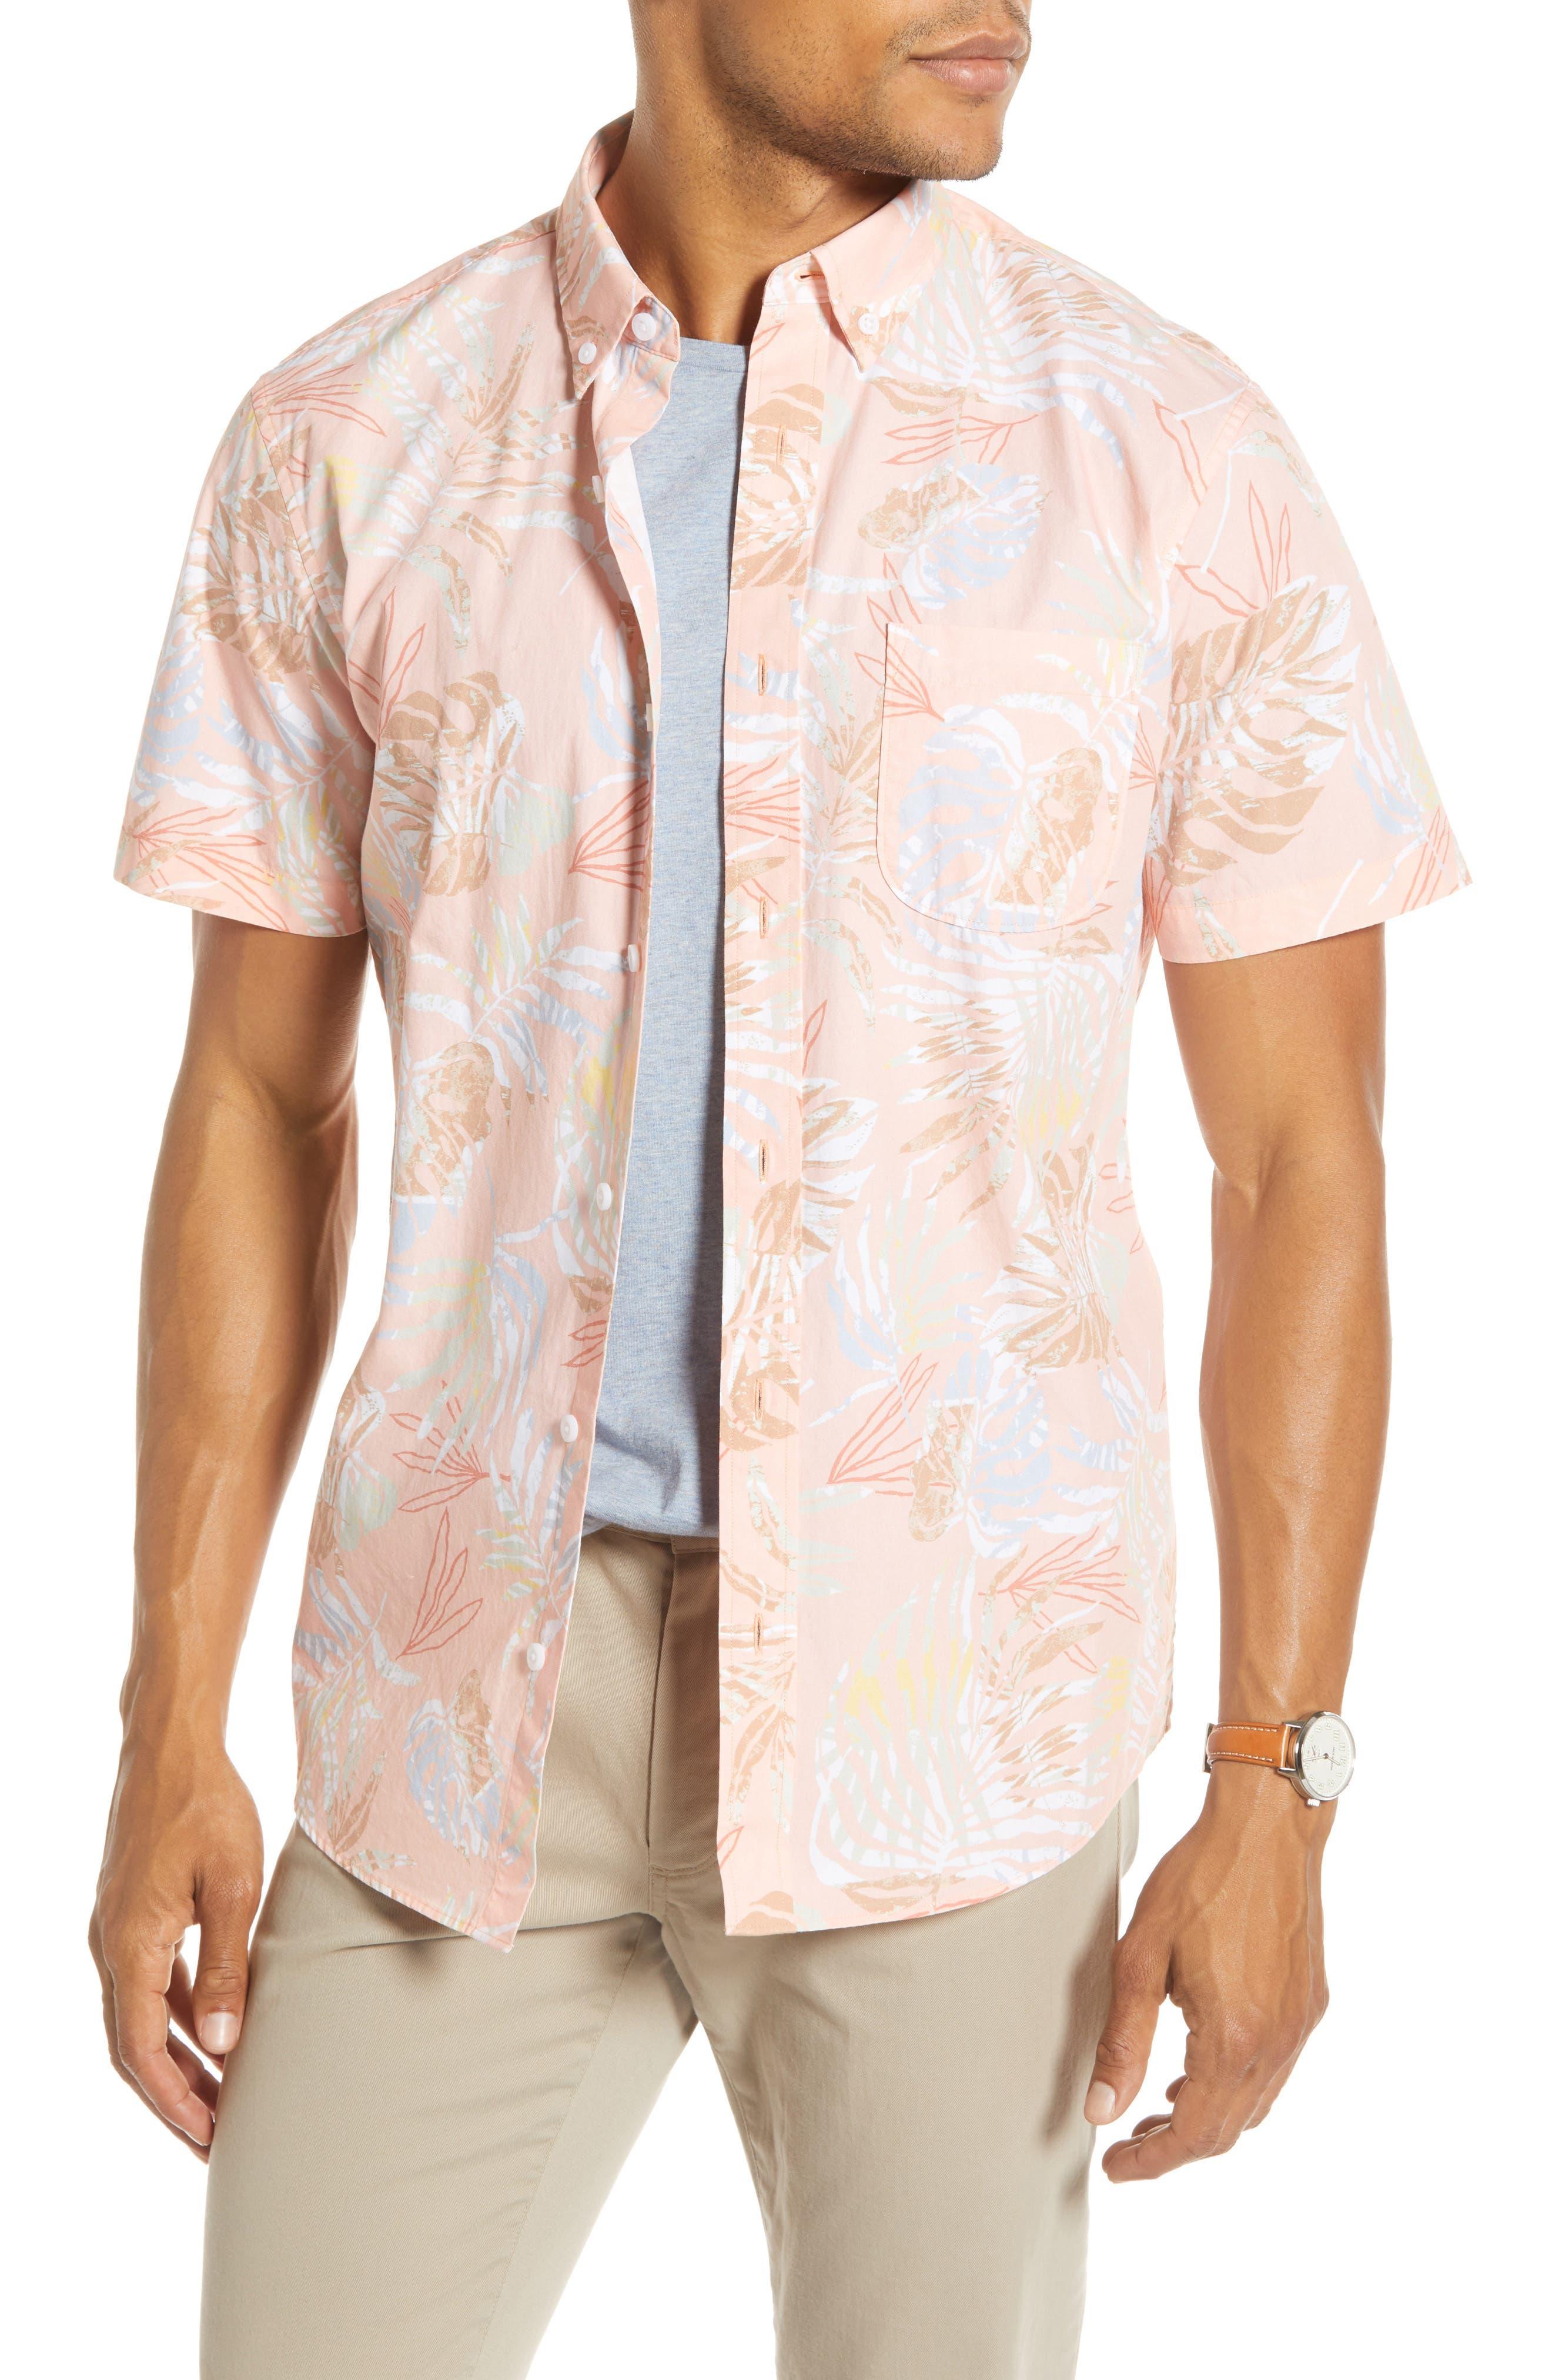 1901 Trim Fit Palm Print Short Sleeve Button-Down Sport Shirt, Coral